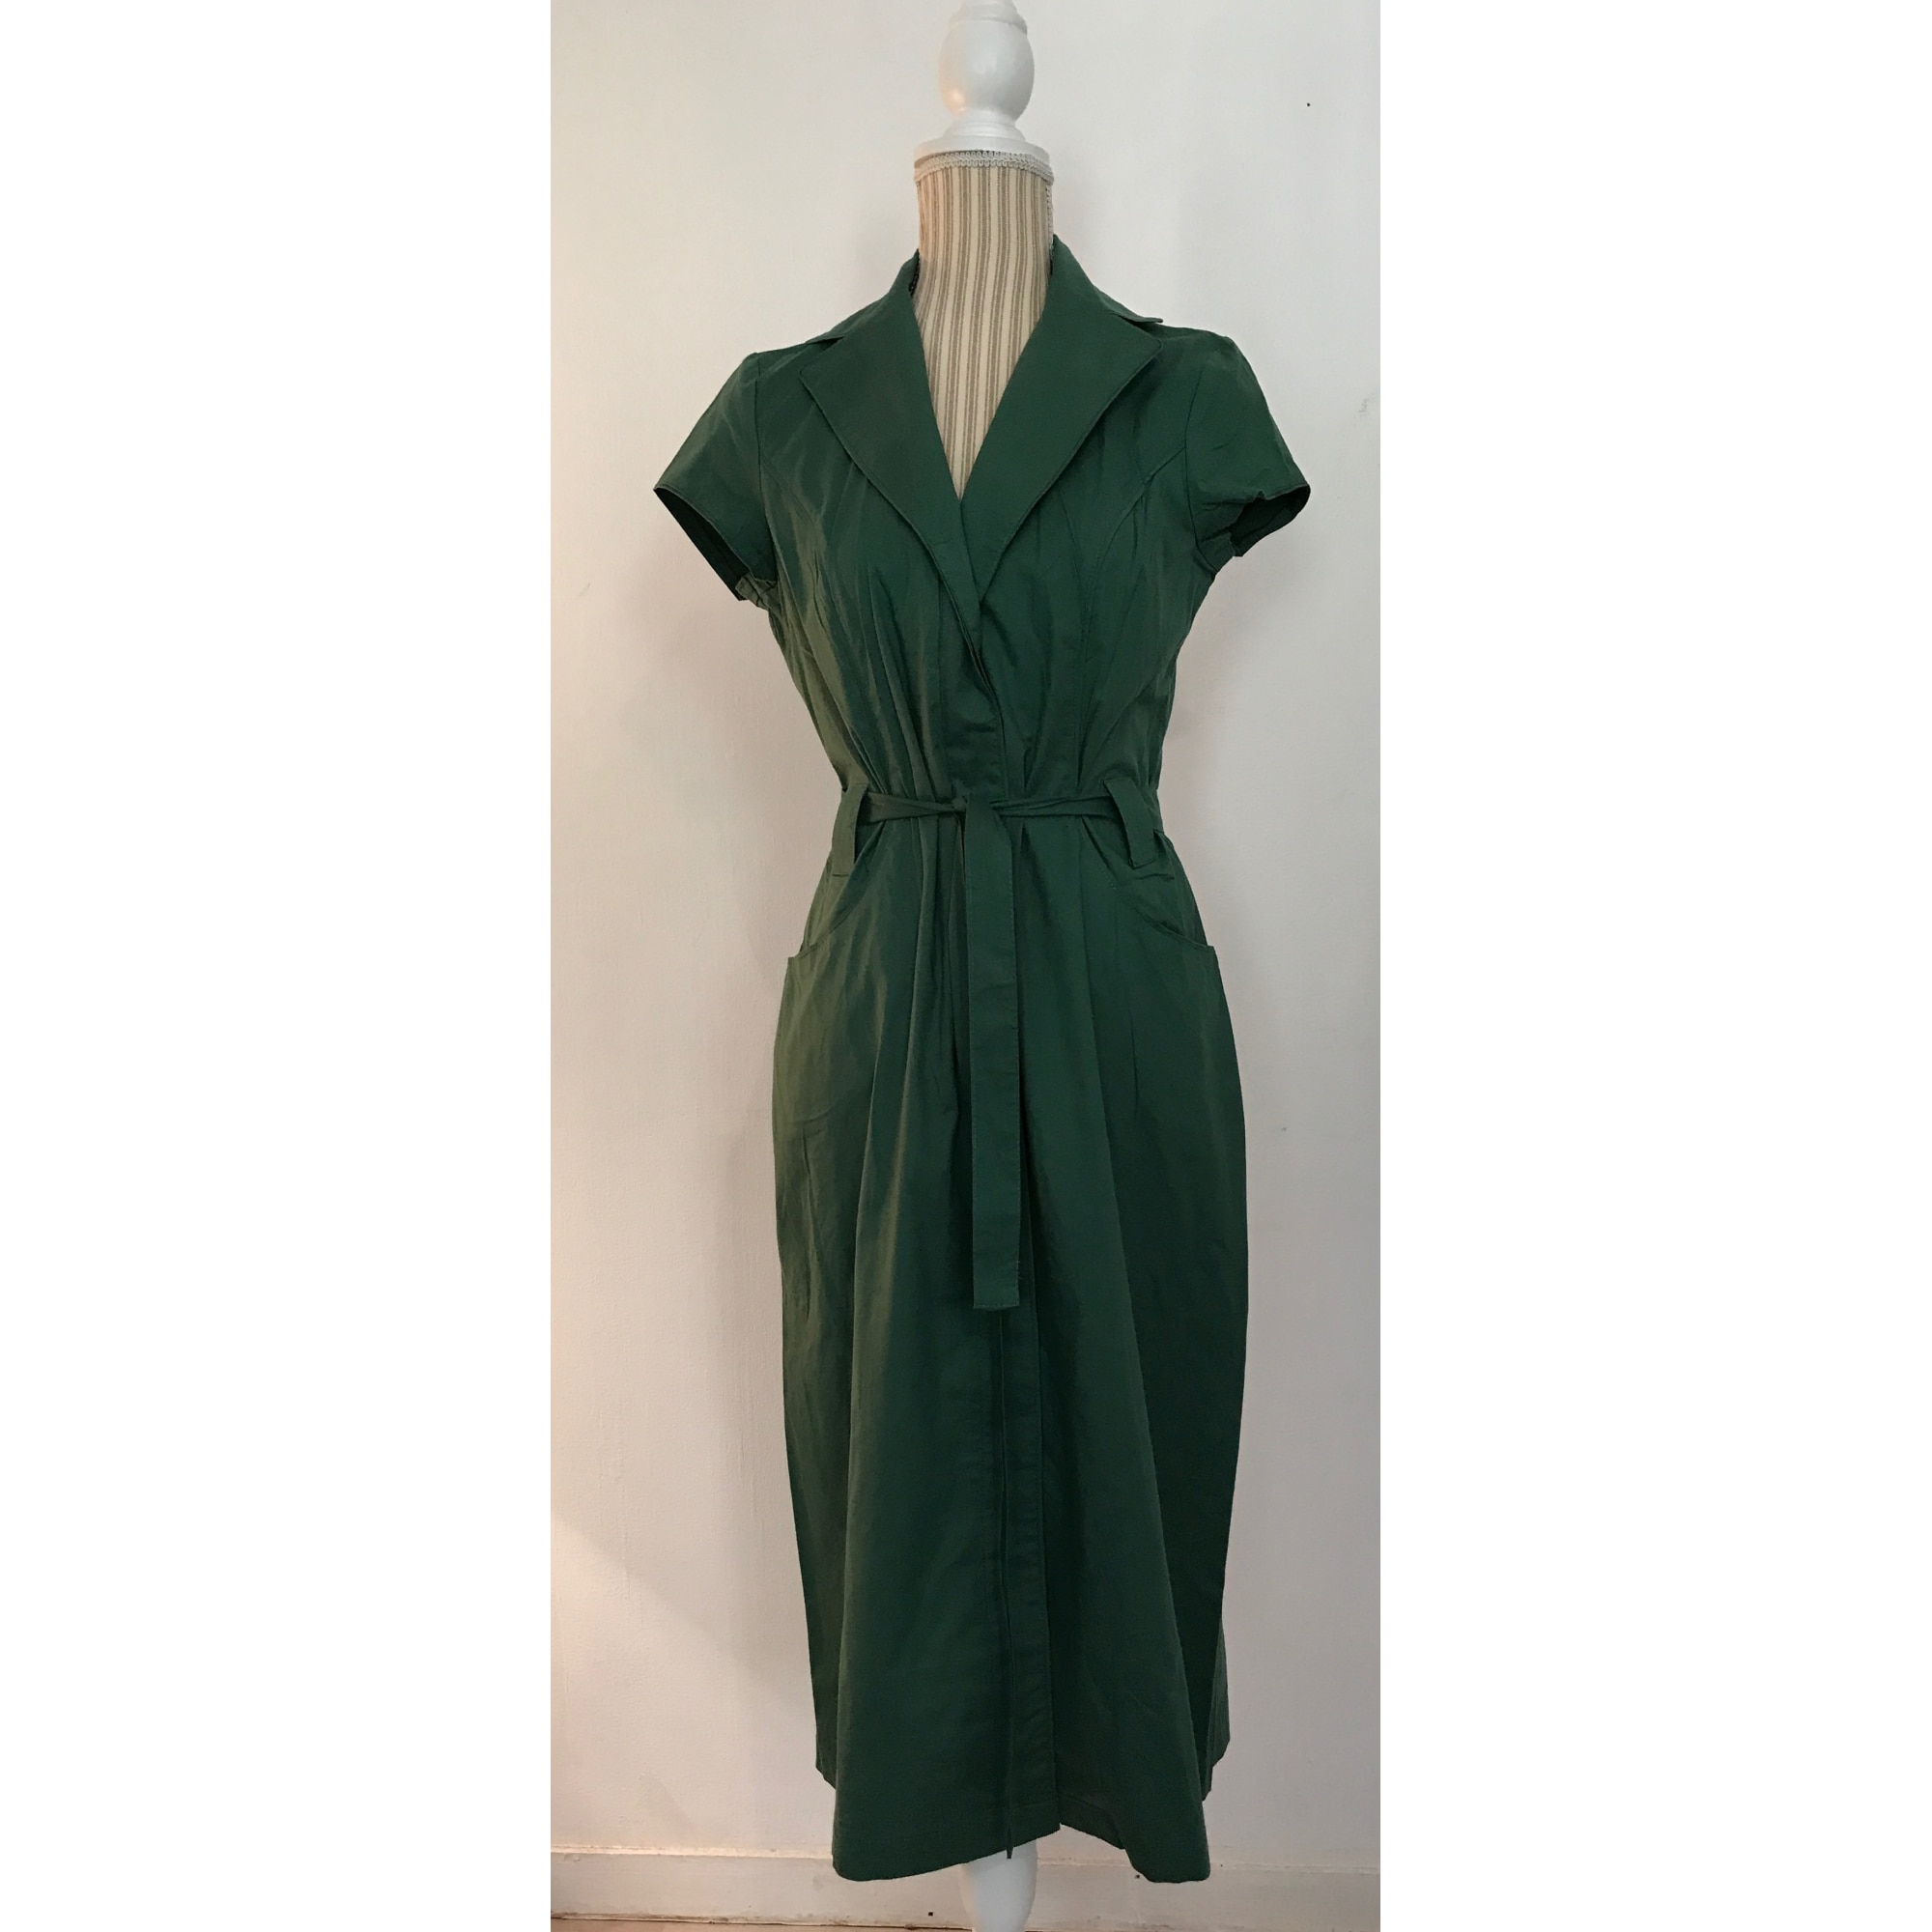 Robe Longue Jacqueline Riu 36 S T1 Vert Vendu Par Nana S Dress In 6733835